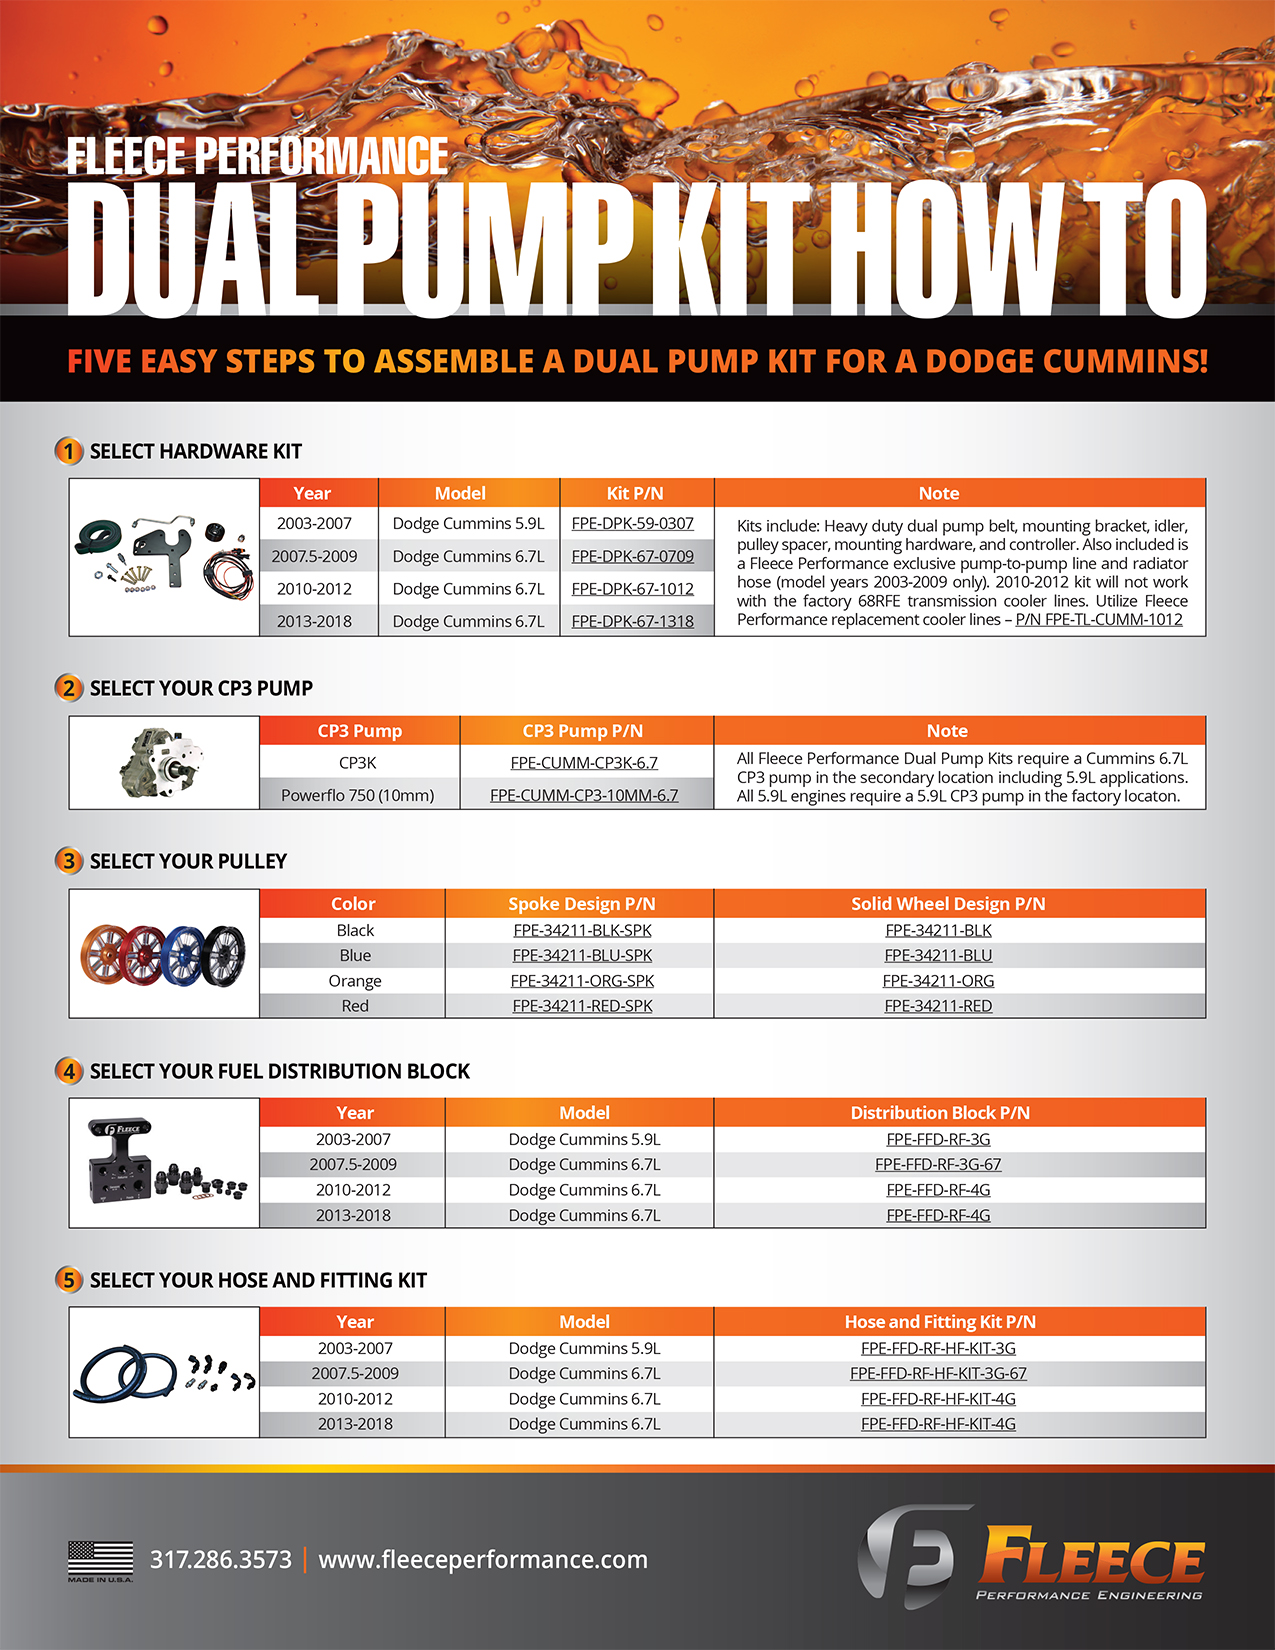 Dual Pump Kits Fuel System Fleece Performance Engineering Inc Innovating Diesel Performance